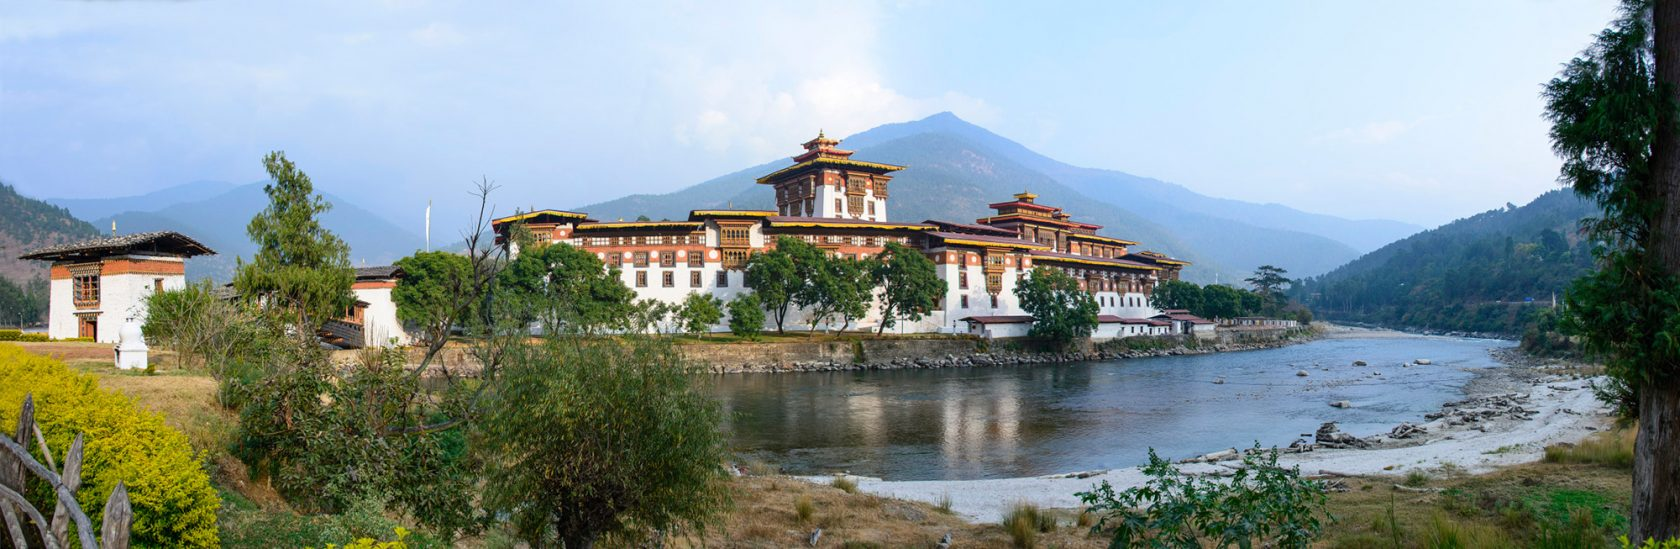 Amankora Punakha, Bhutan – Dzong Paro